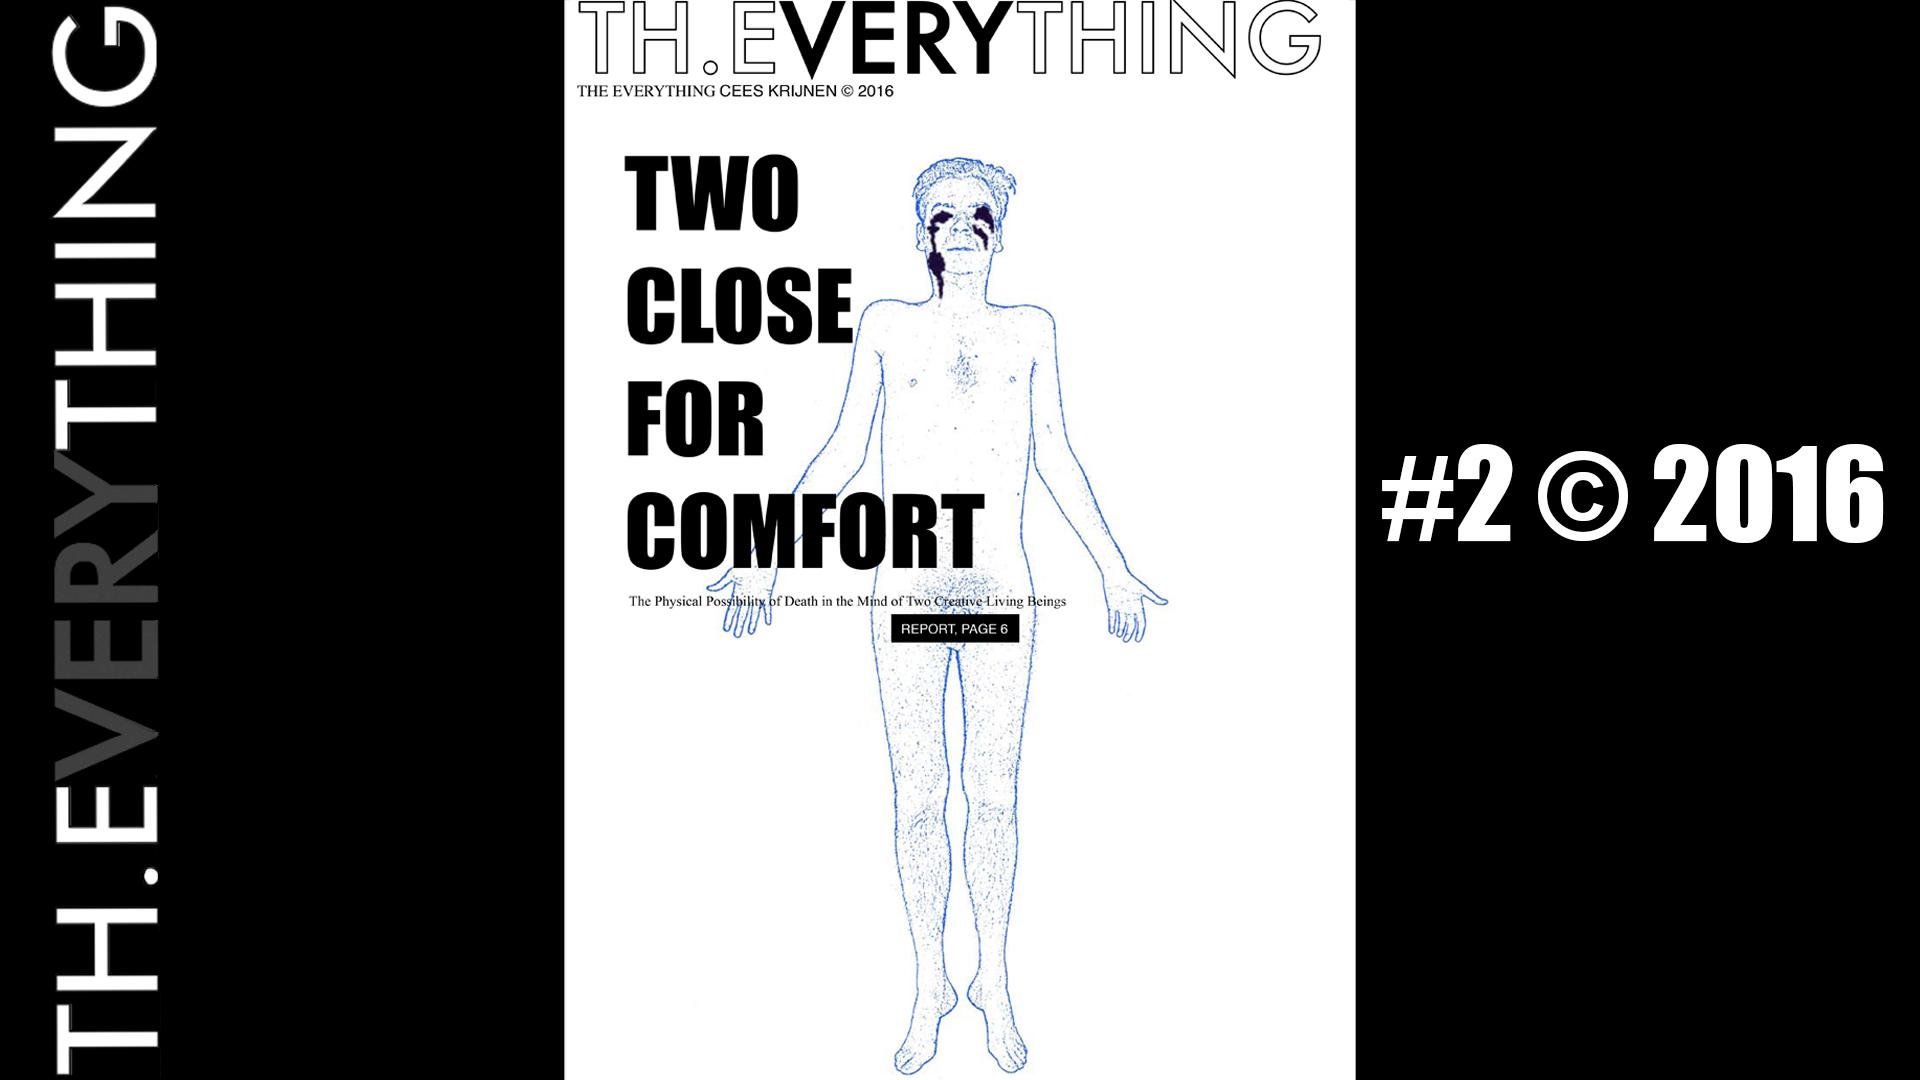 thumbnail naar TH.EVERYTING#5